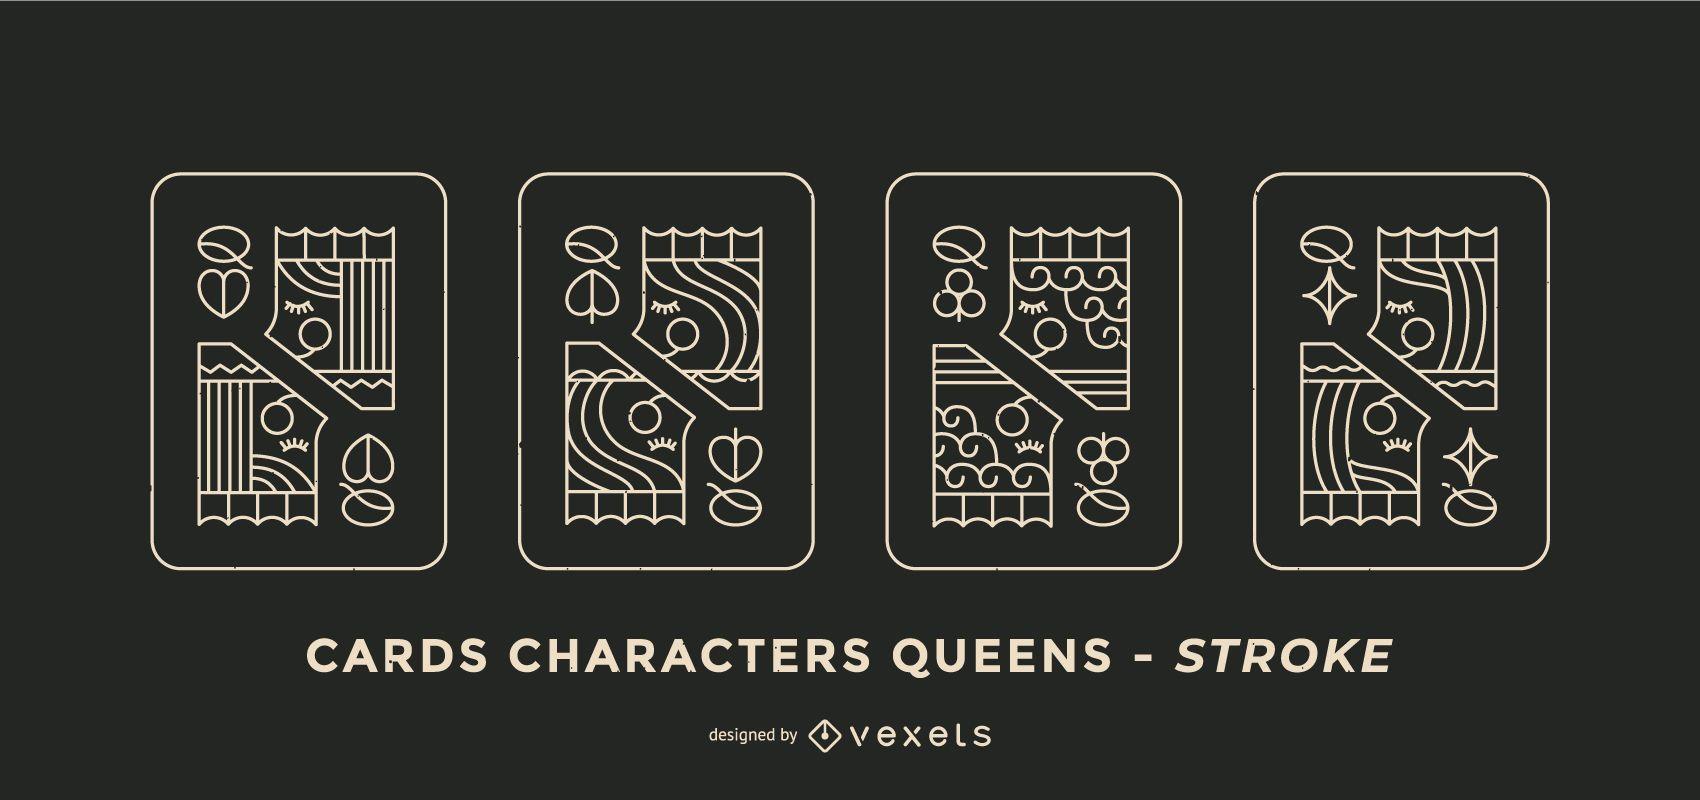 Juego de diseño de trazo de reina de cartas de póquer